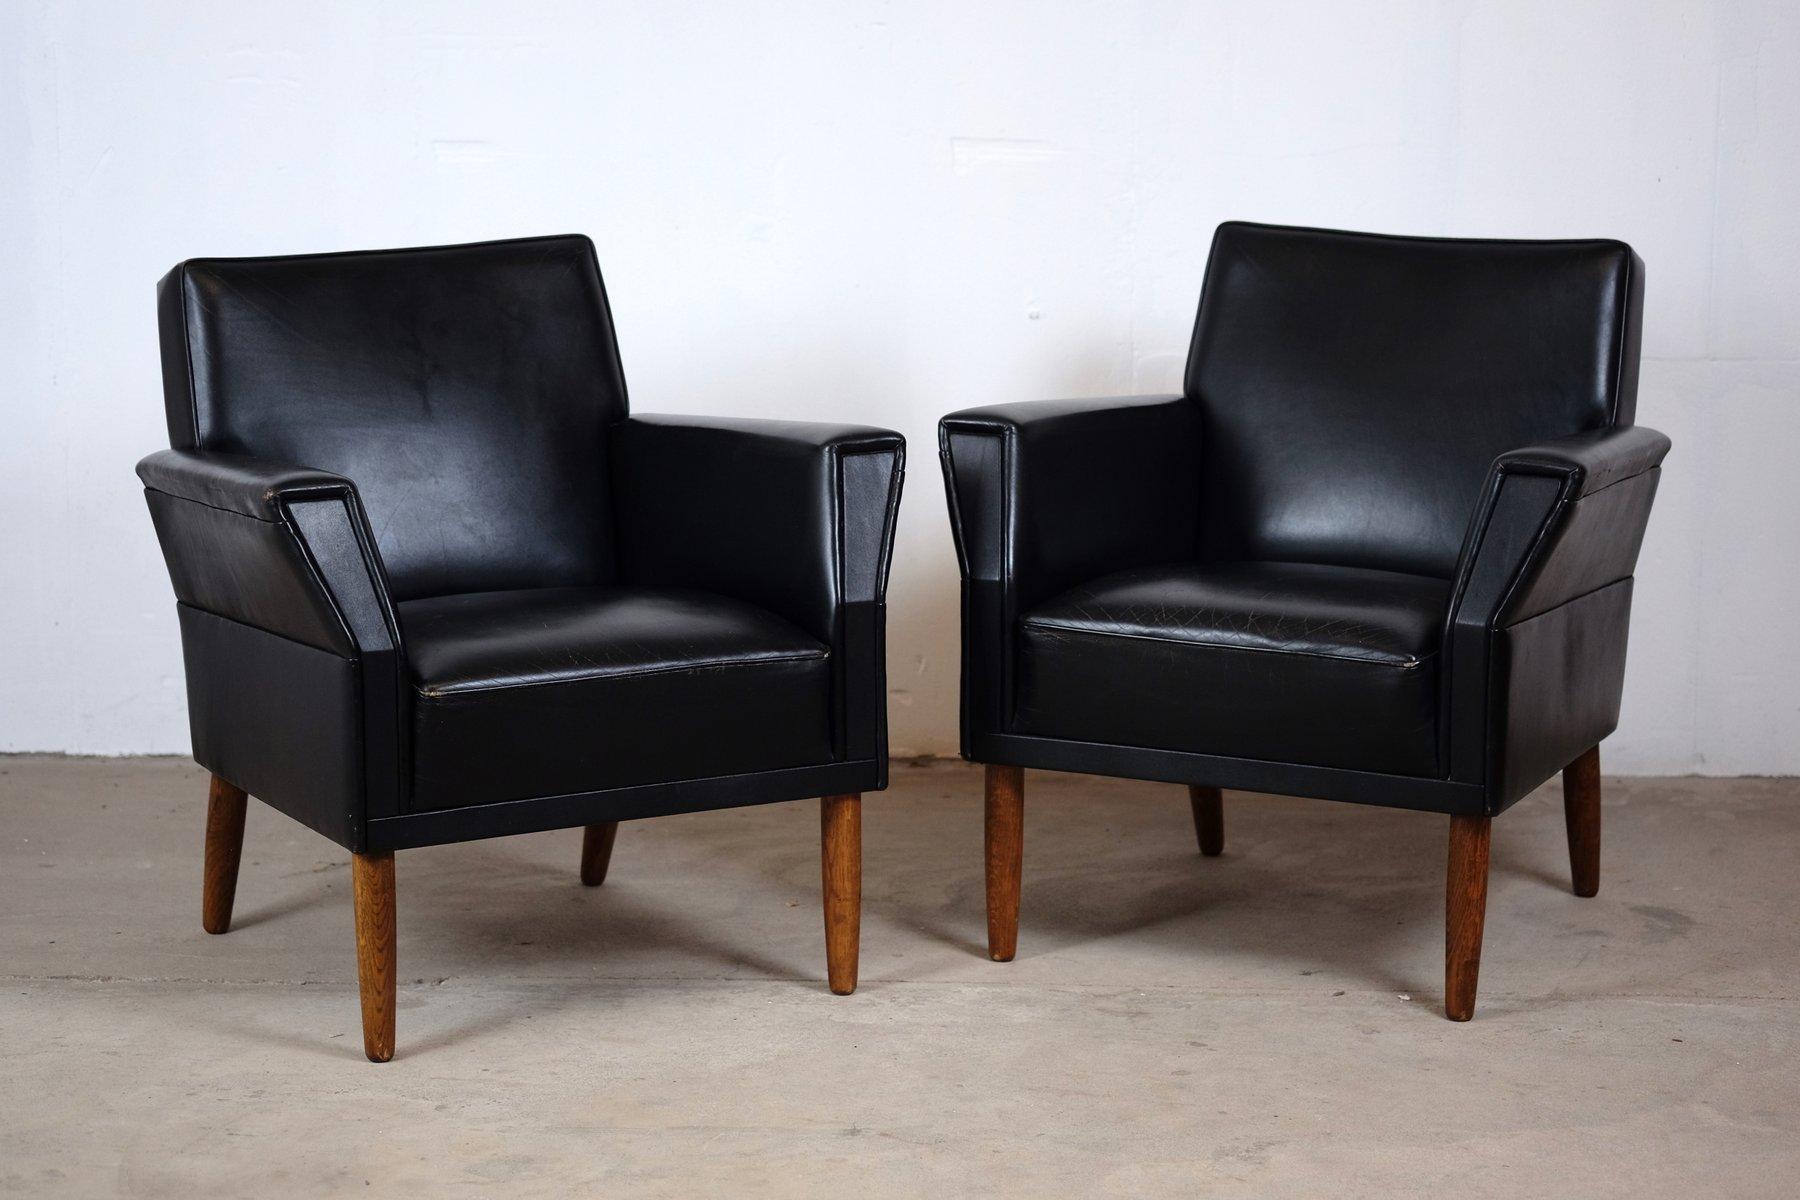 d nische mid century sessel aus schwarzem leder 2er set bei pamono kaufen. Black Bedroom Furniture Sets. Home Design Ideas